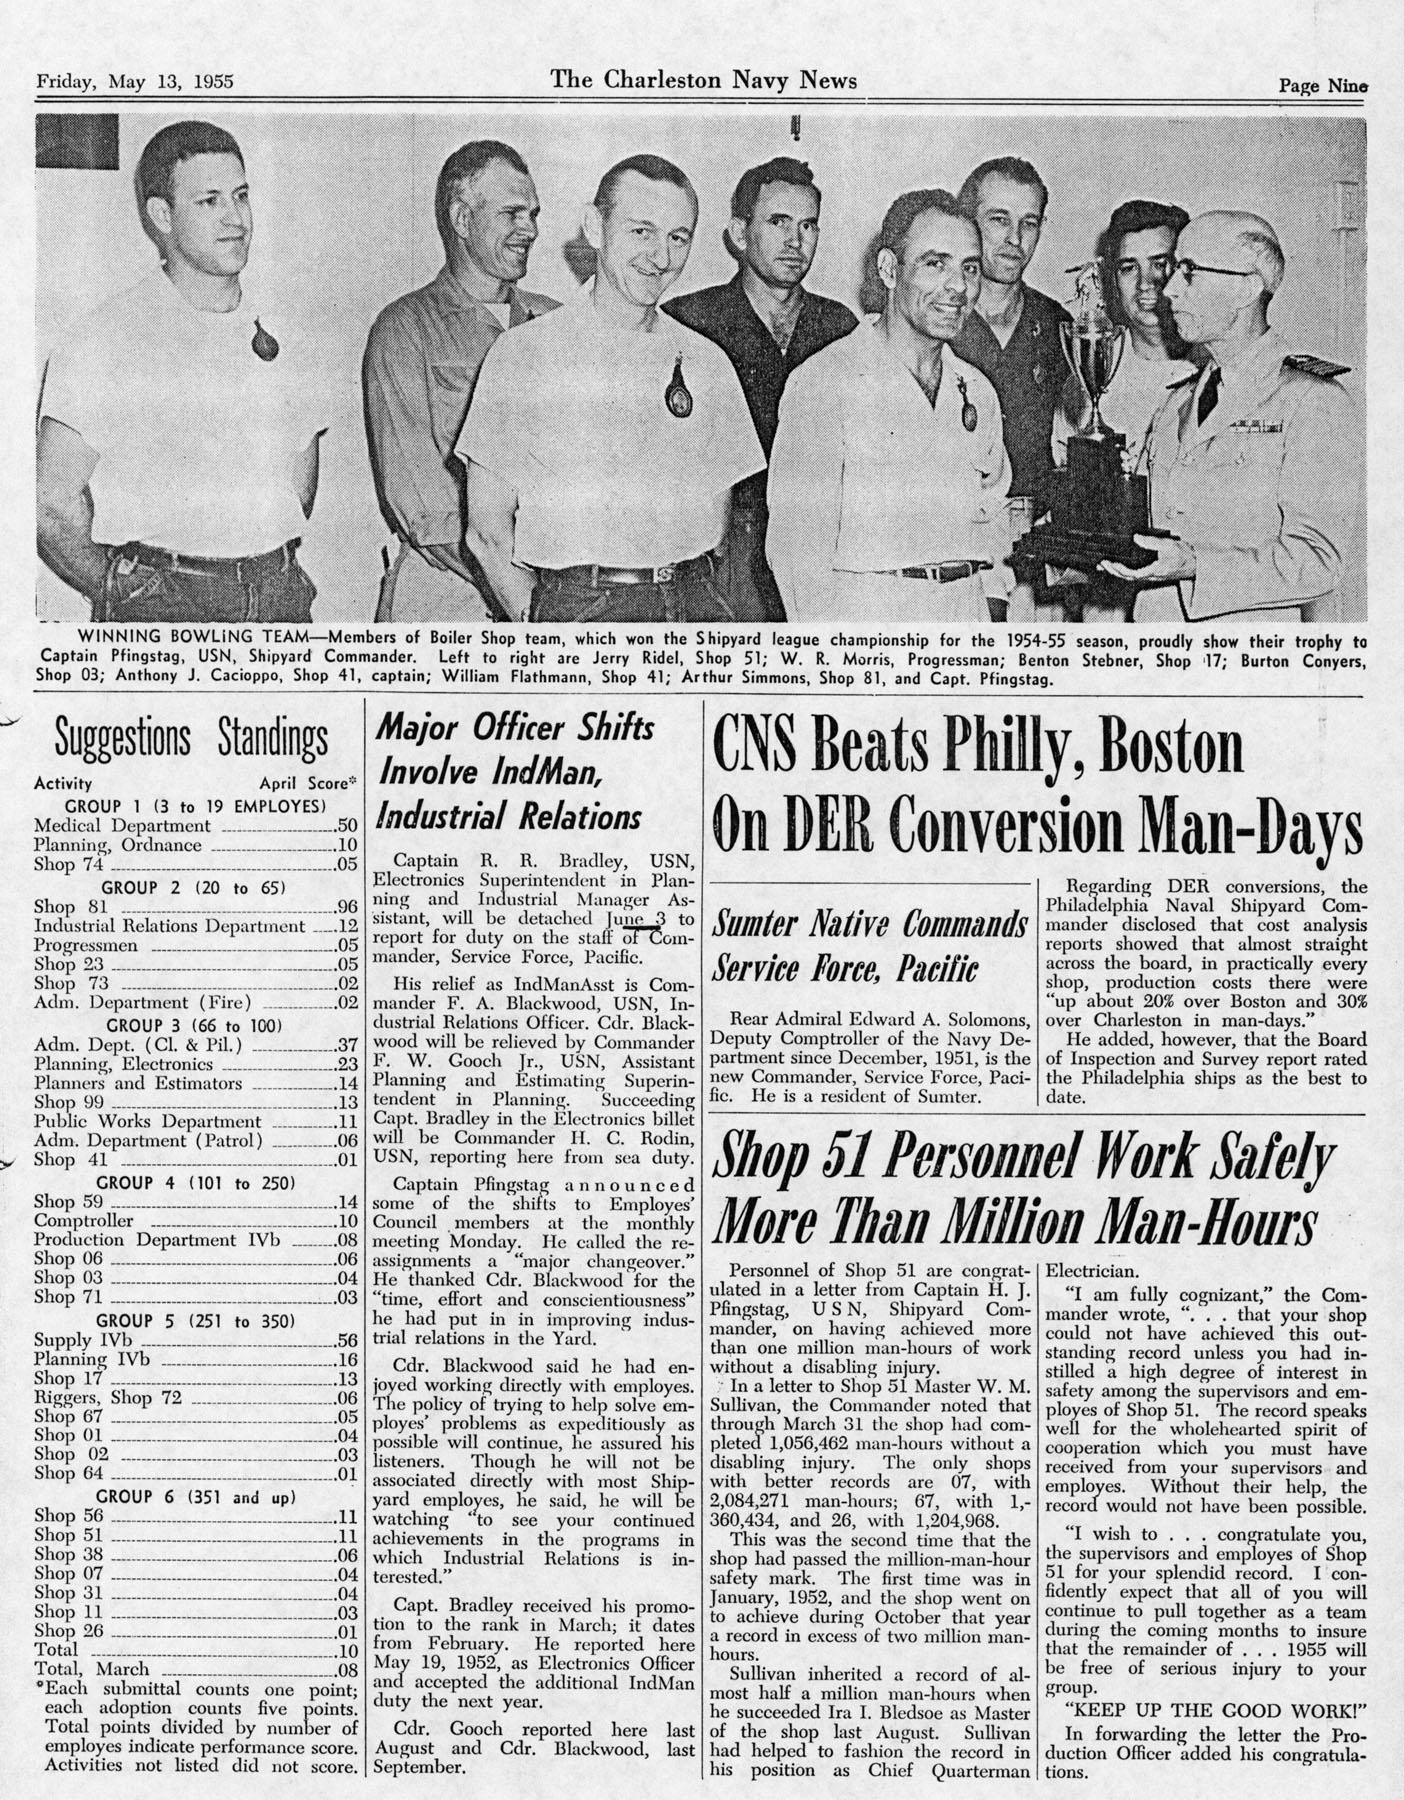 The Charleston Navy News, Volume 13, Edition 22, page ix